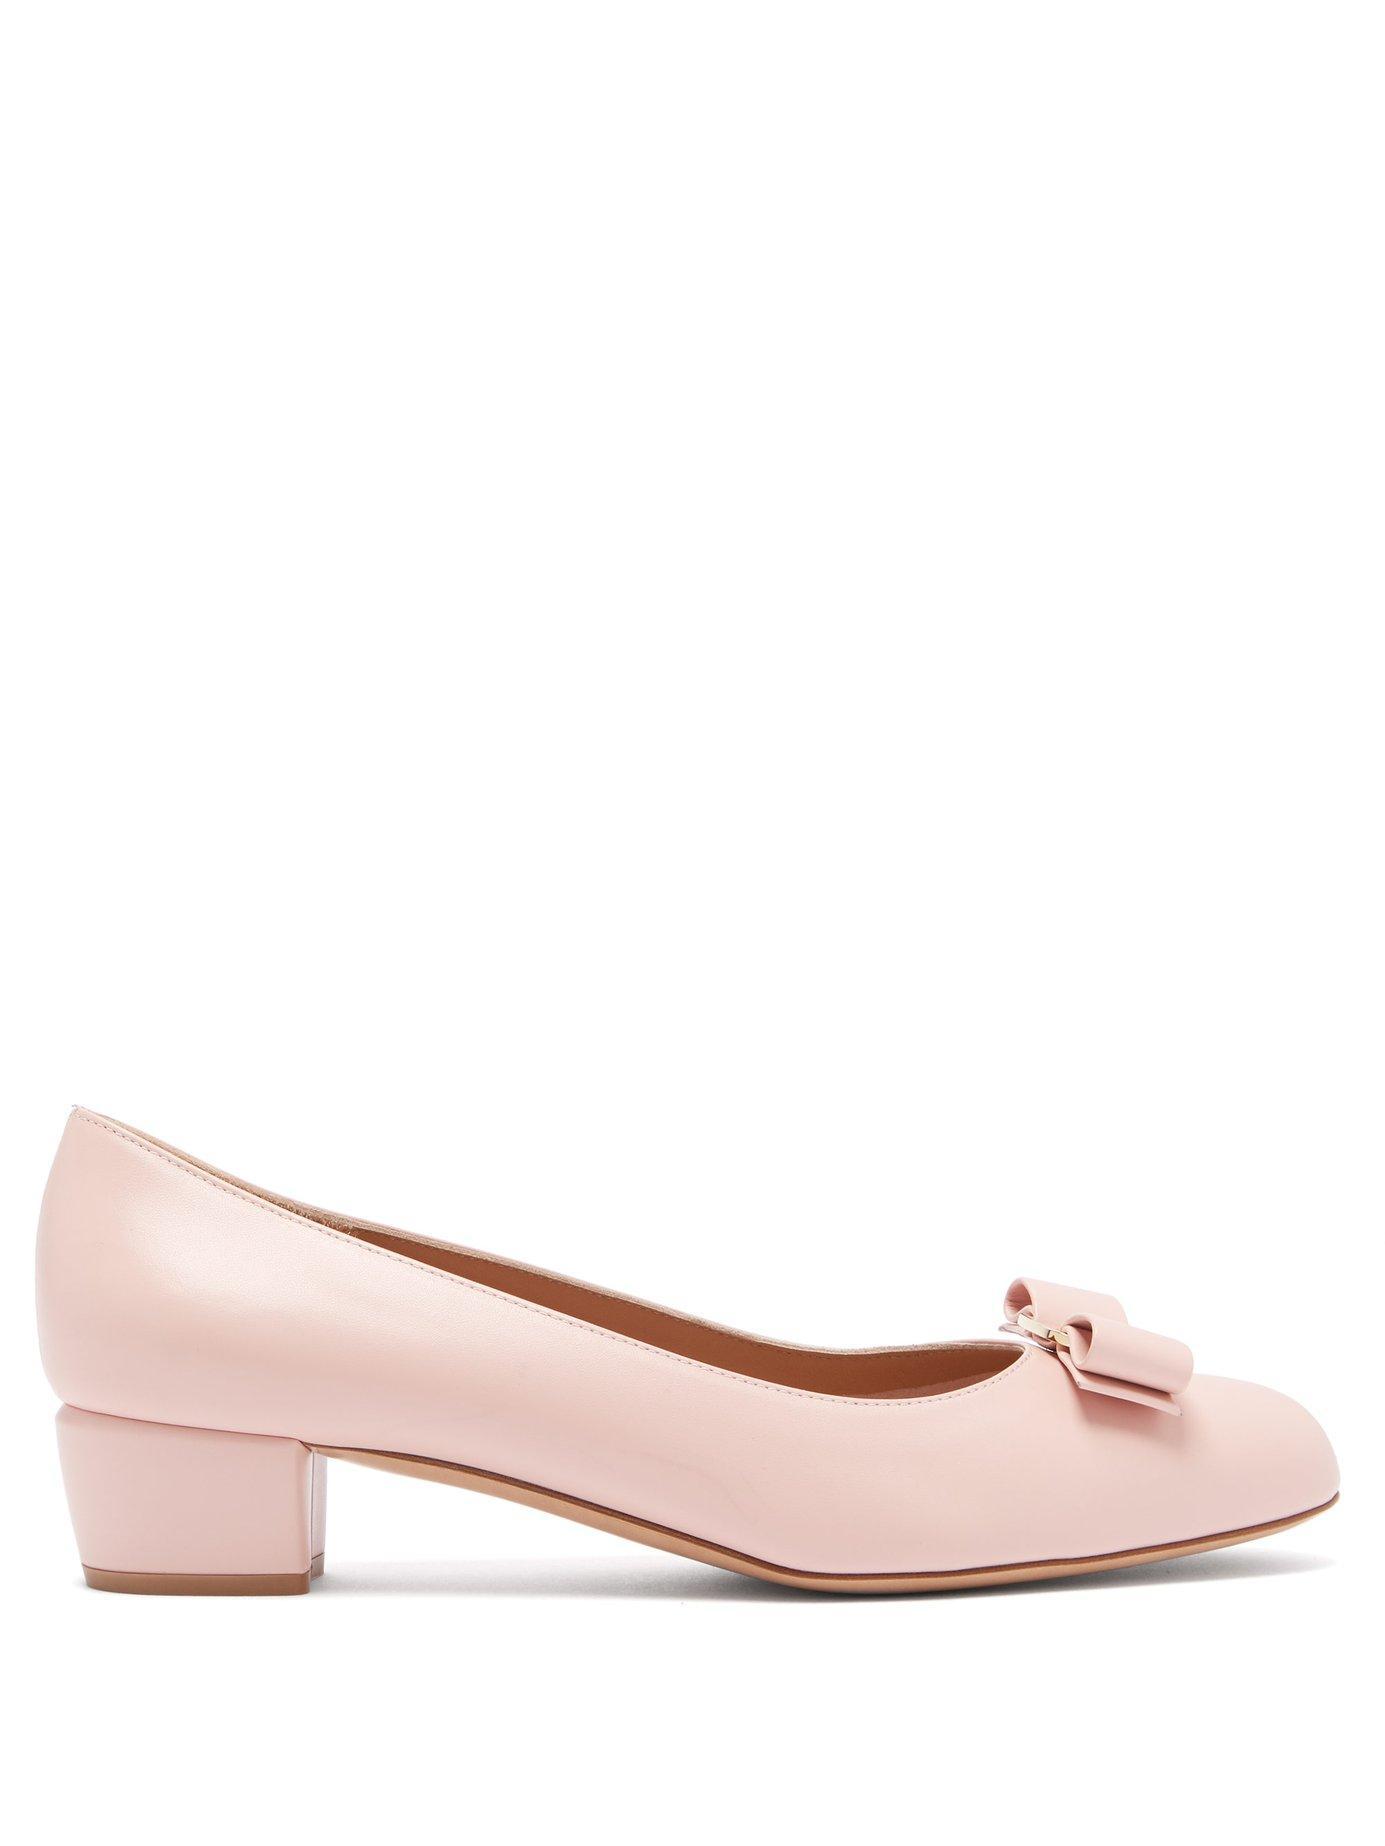 5642235e7c71 Lyst - Ferragamo Vara Leather Pumps in Pink